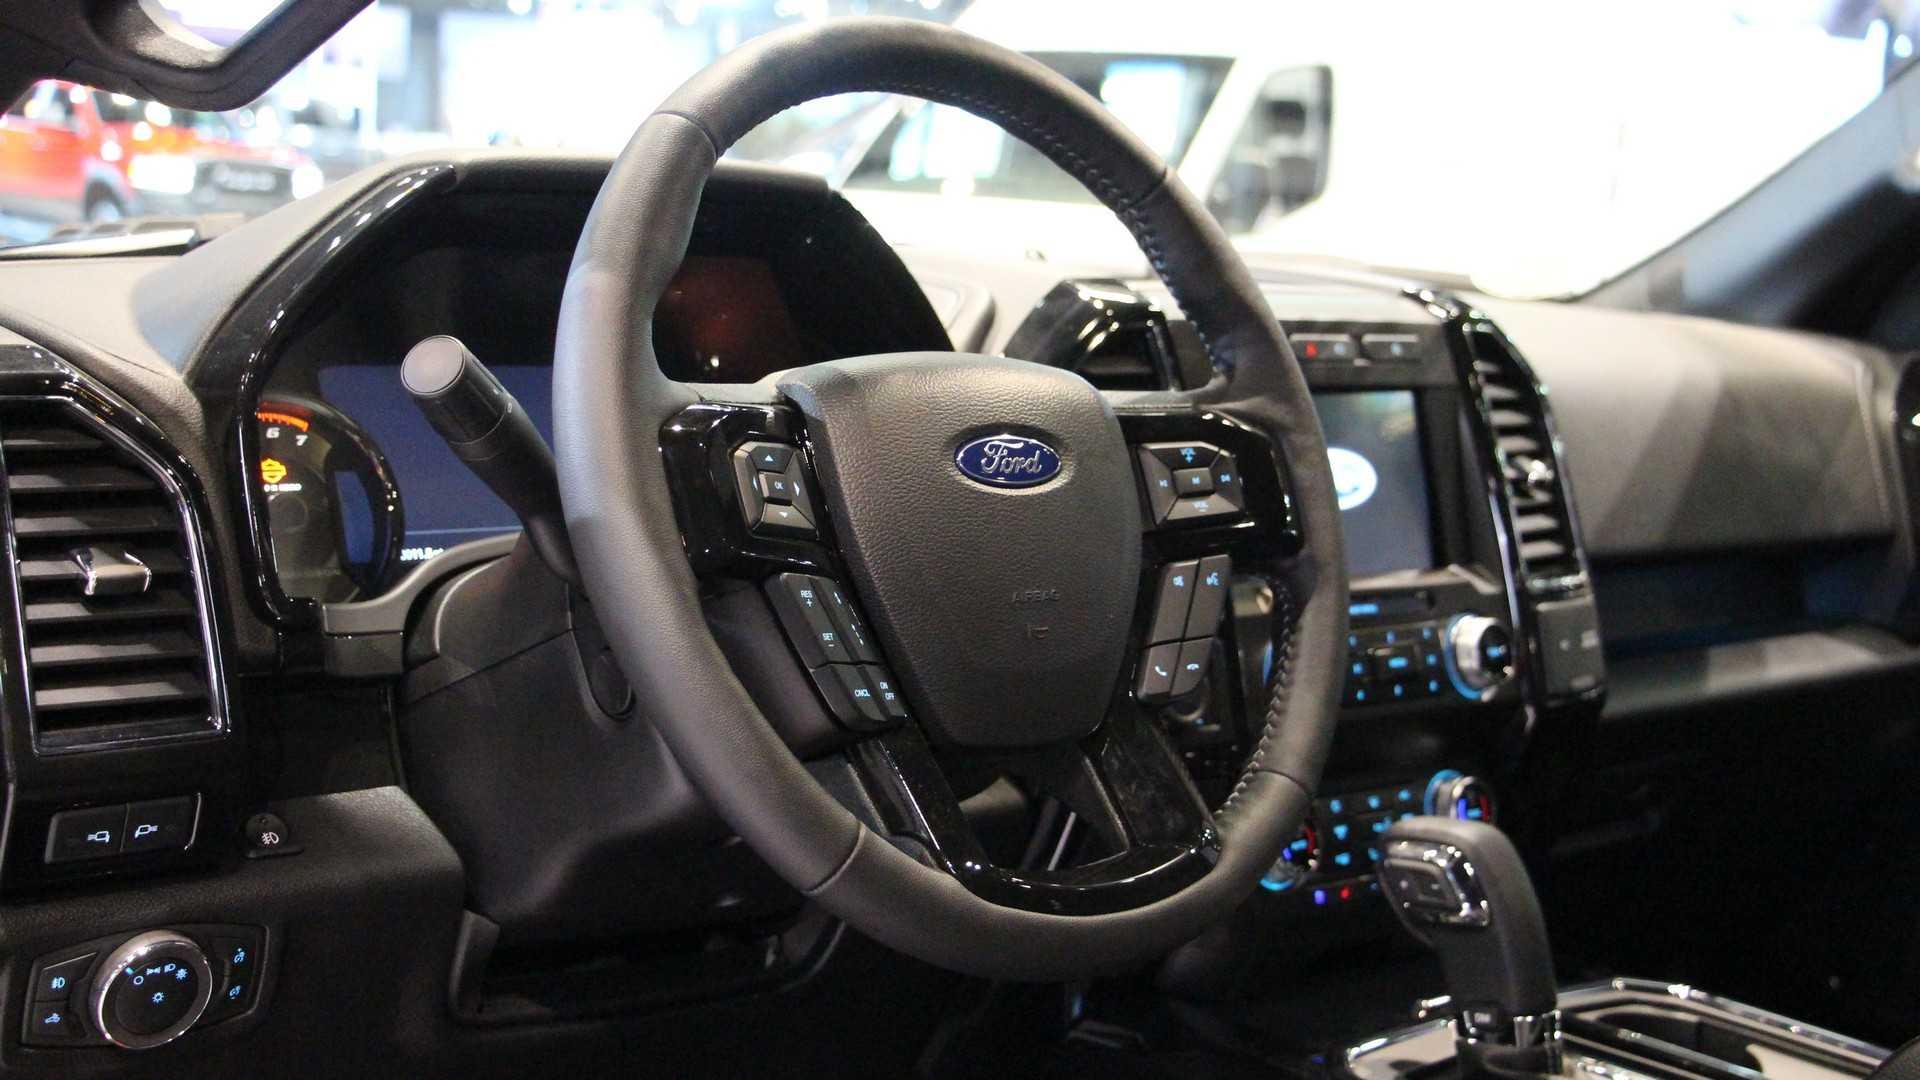 2019-ford-f-150-harley-davidson-edition (4)